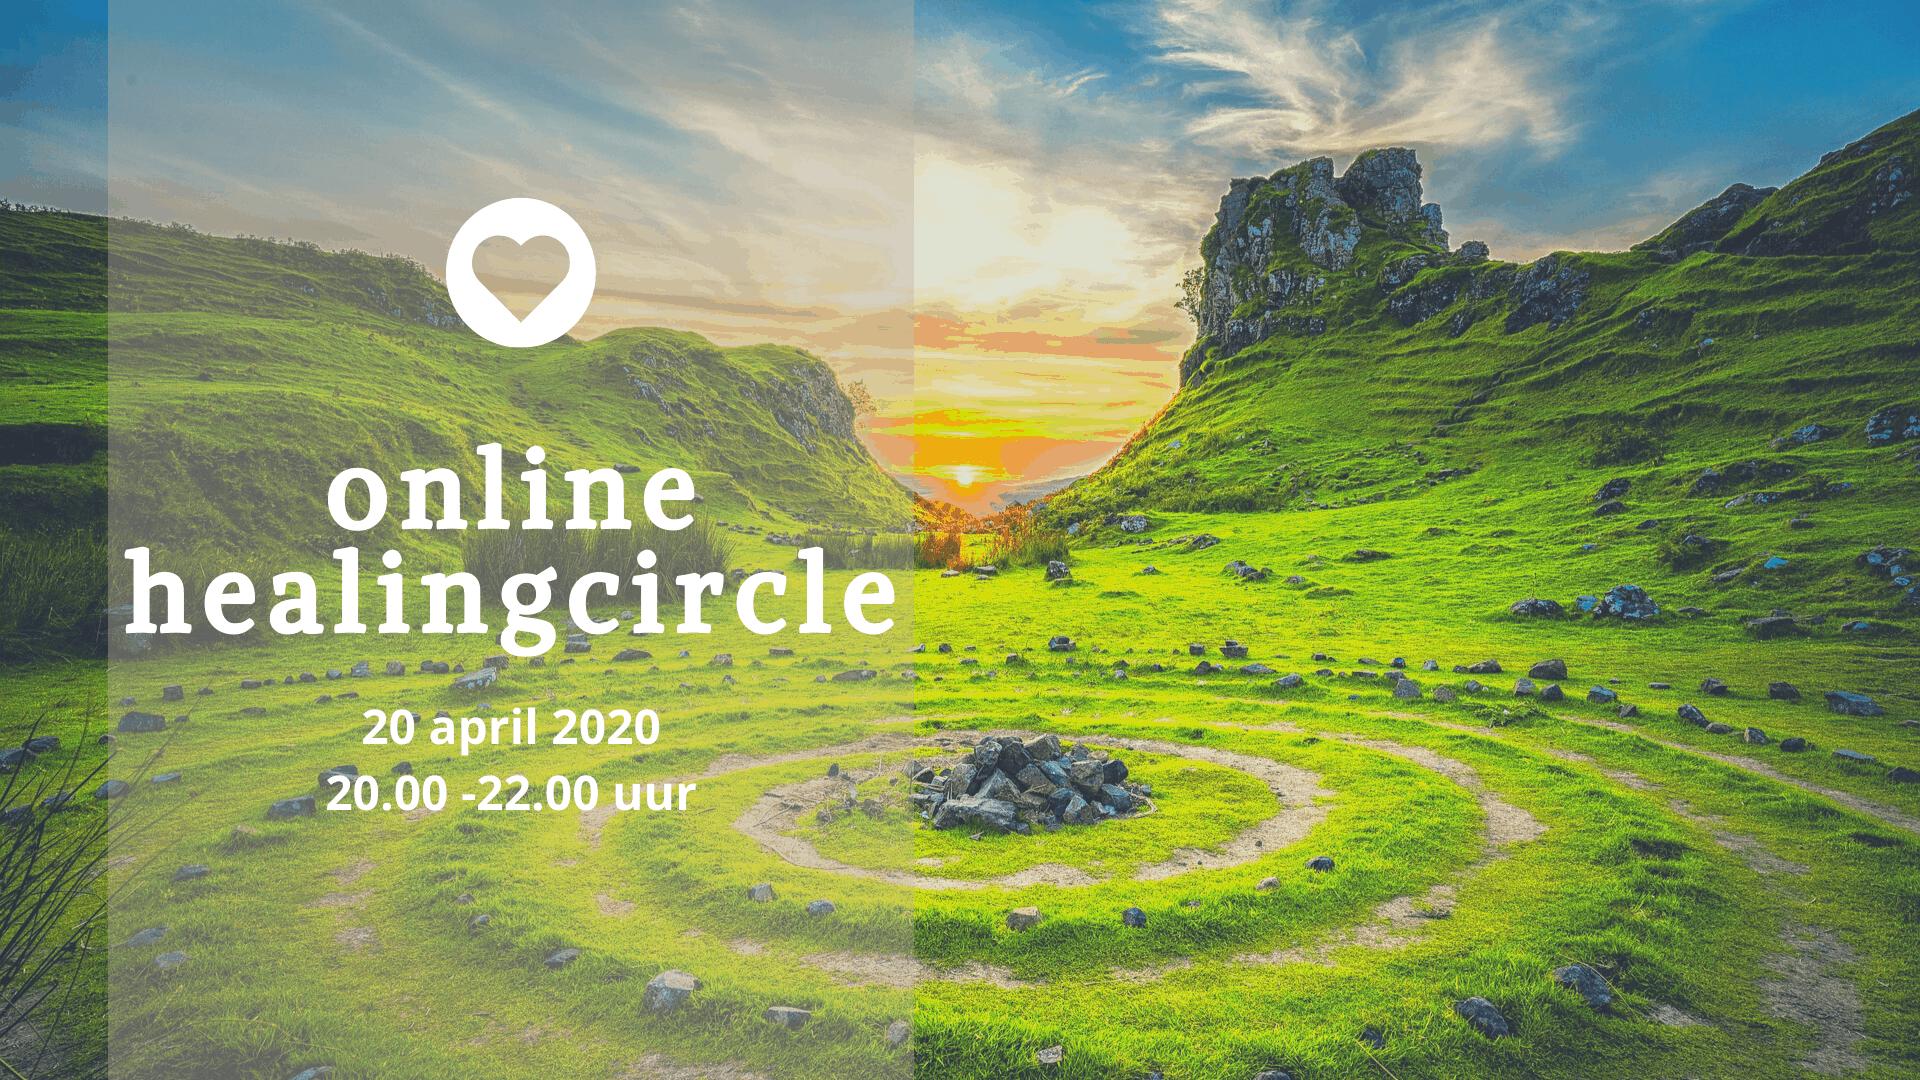 Online healingcircle